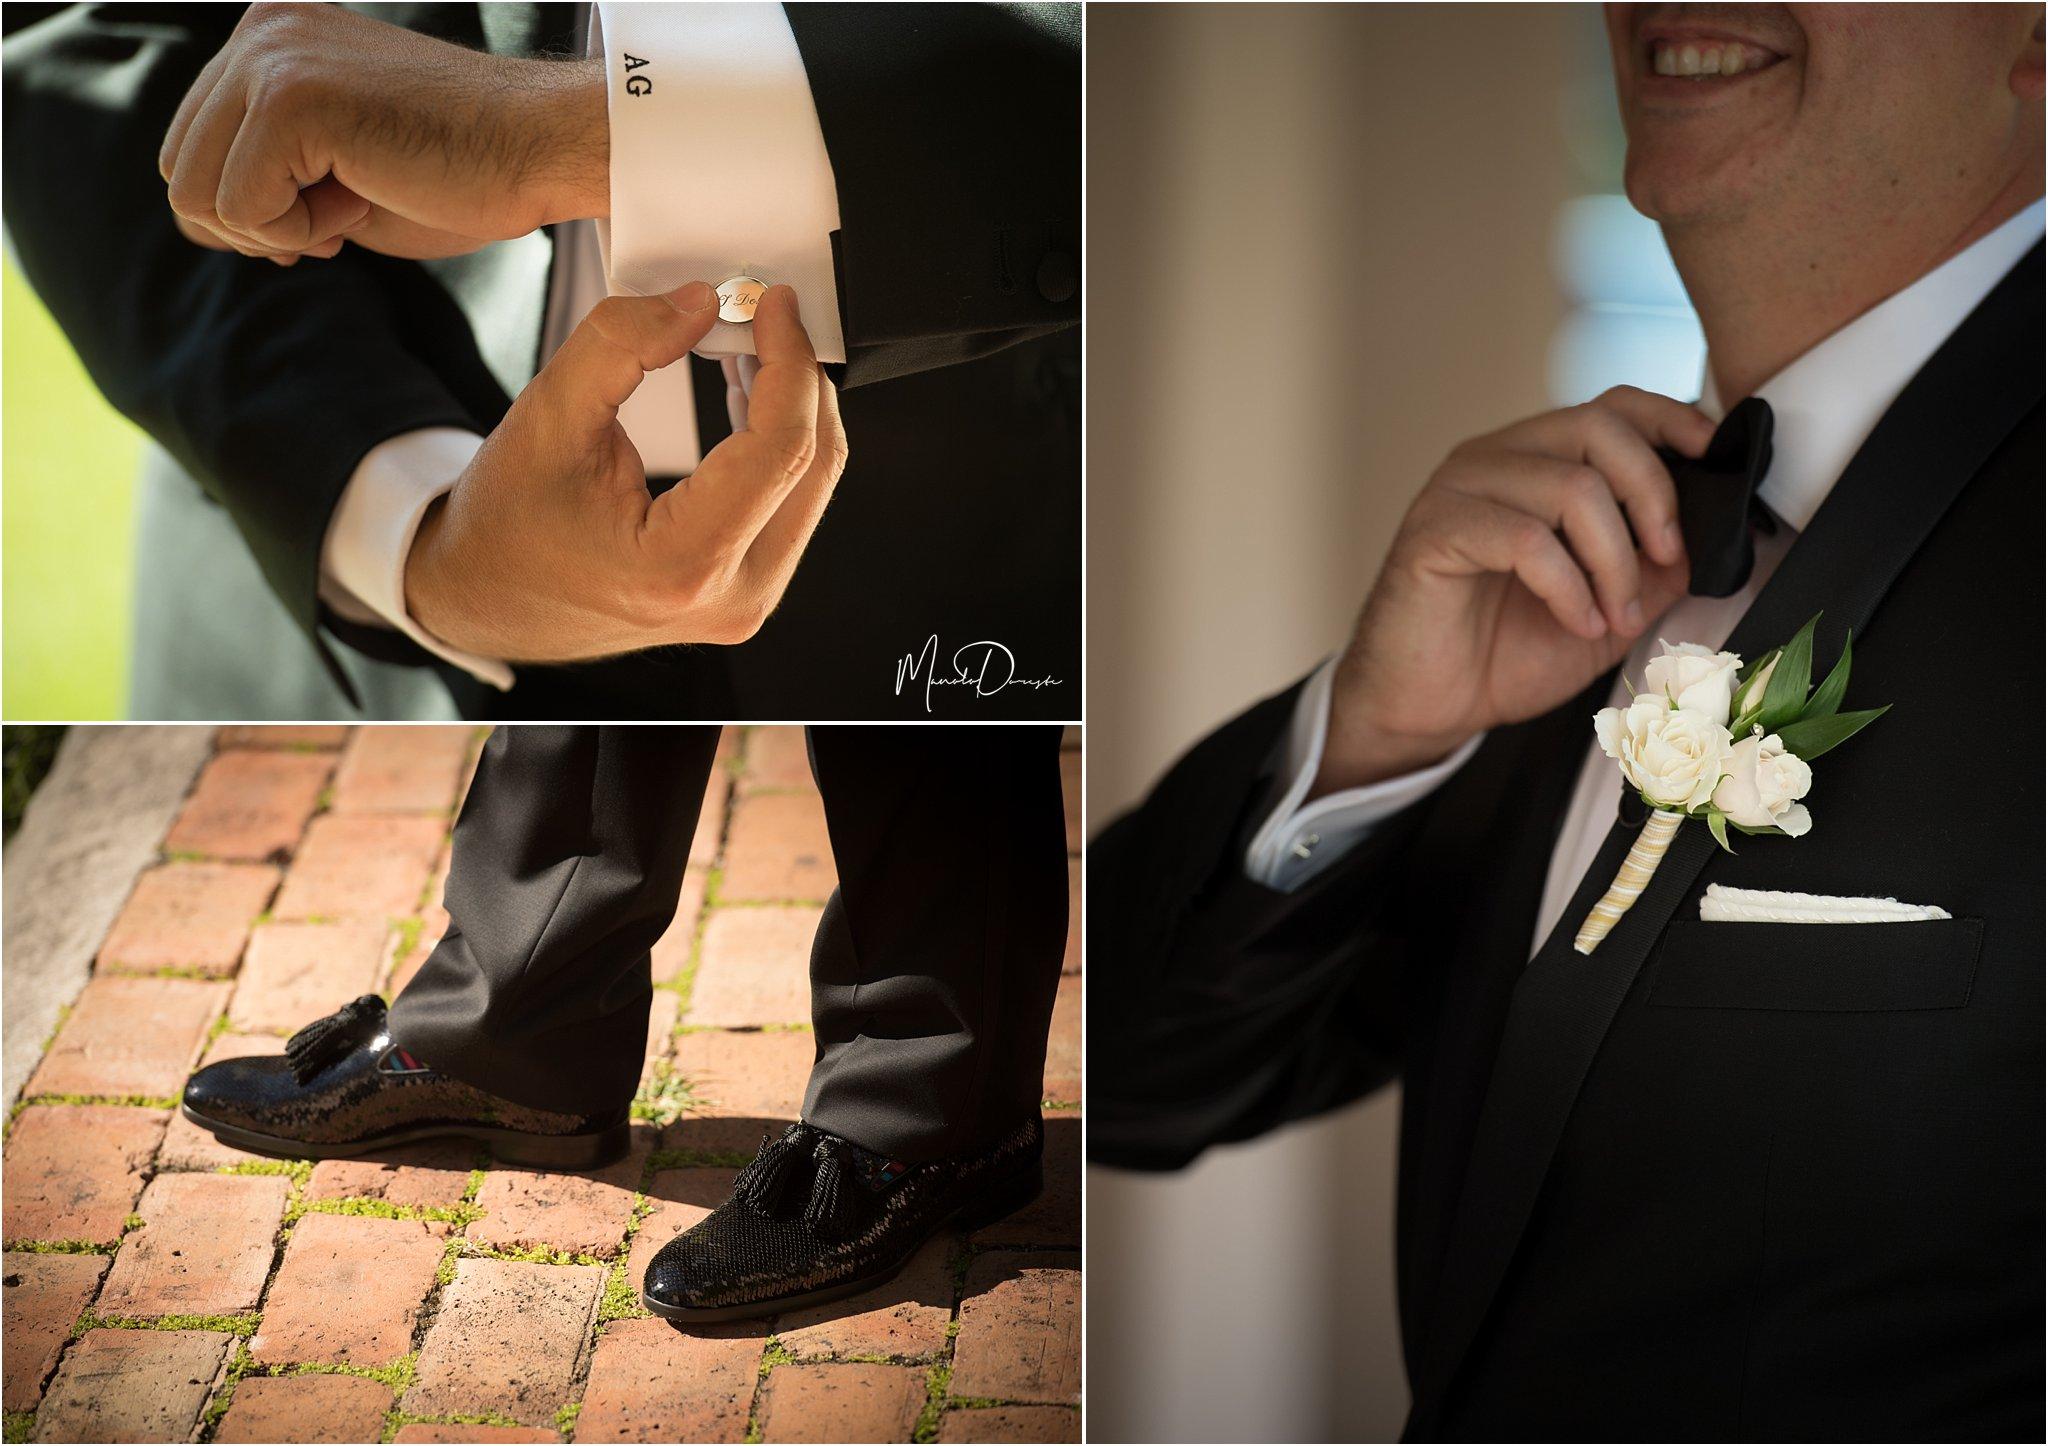 00715_ManoloDoreste_InFocusStudios_Wedding_Family_Photography_Miami_MiamiPhotographer.jpg